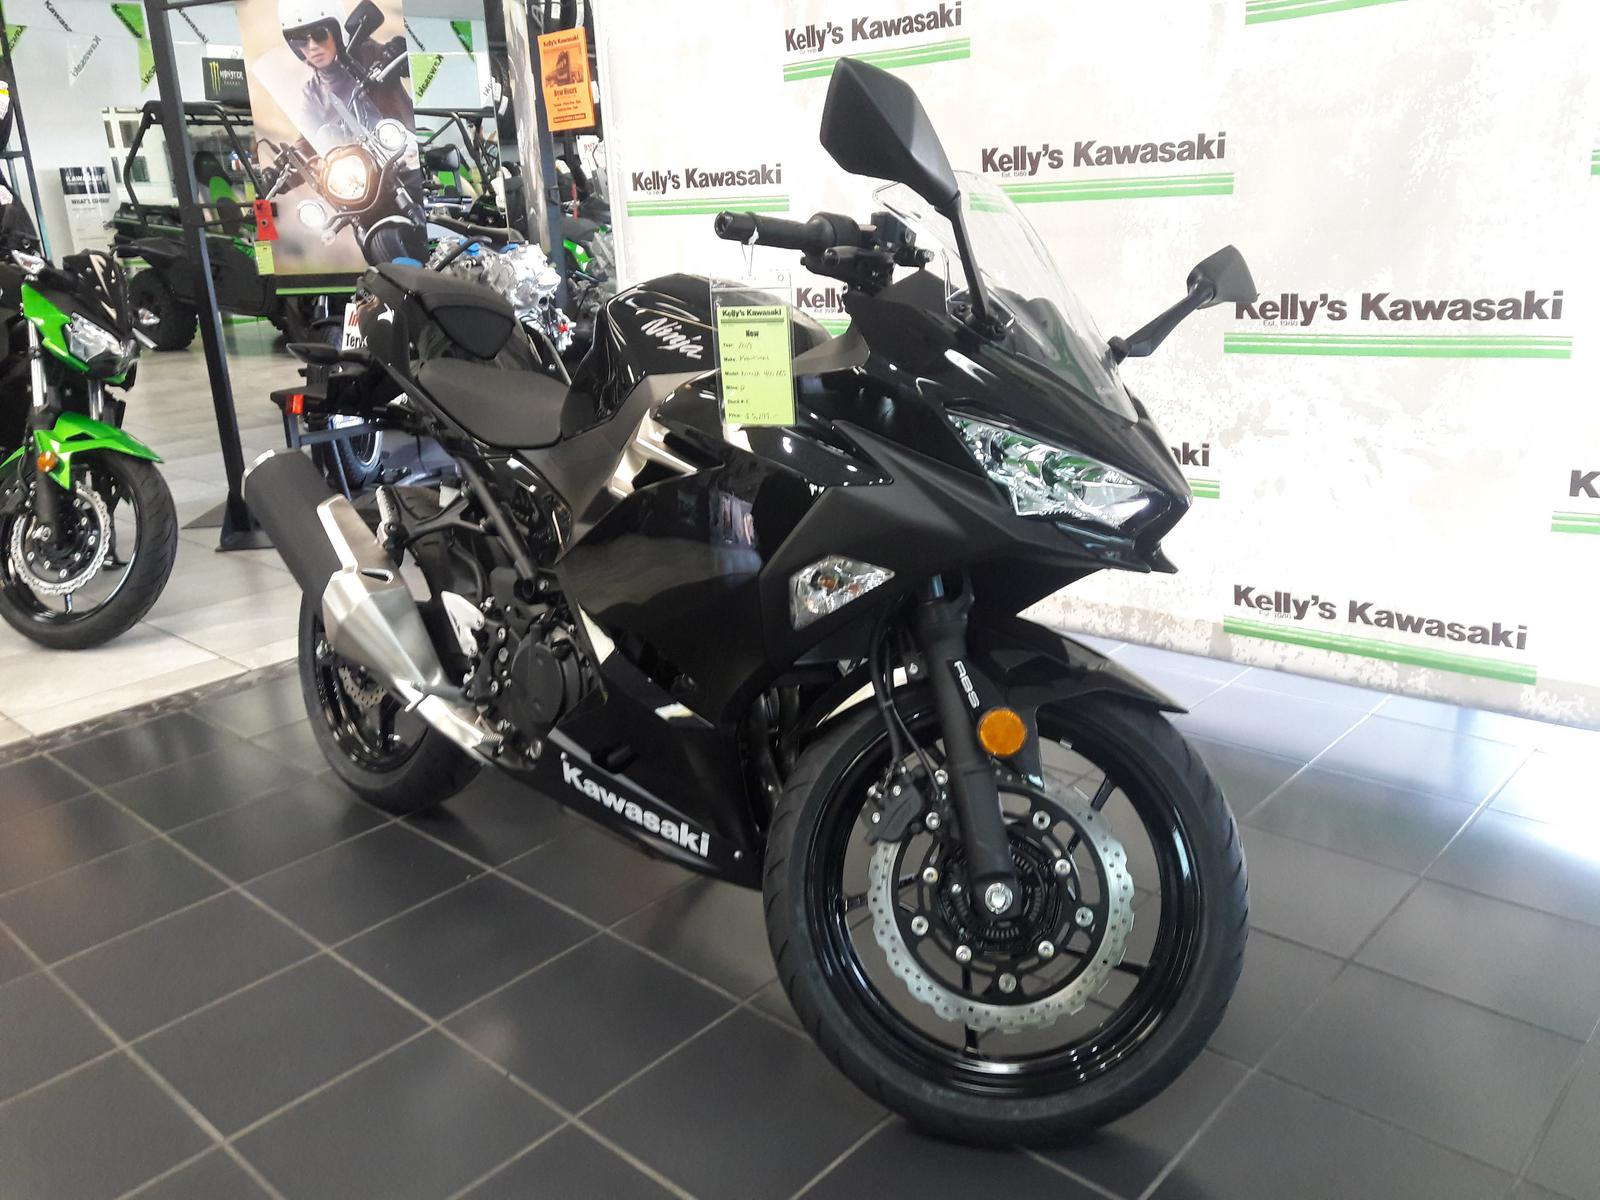 2019 Kawasaki Ninja 400 Abs For Sale In Mesa Az Kellys Kawasaki